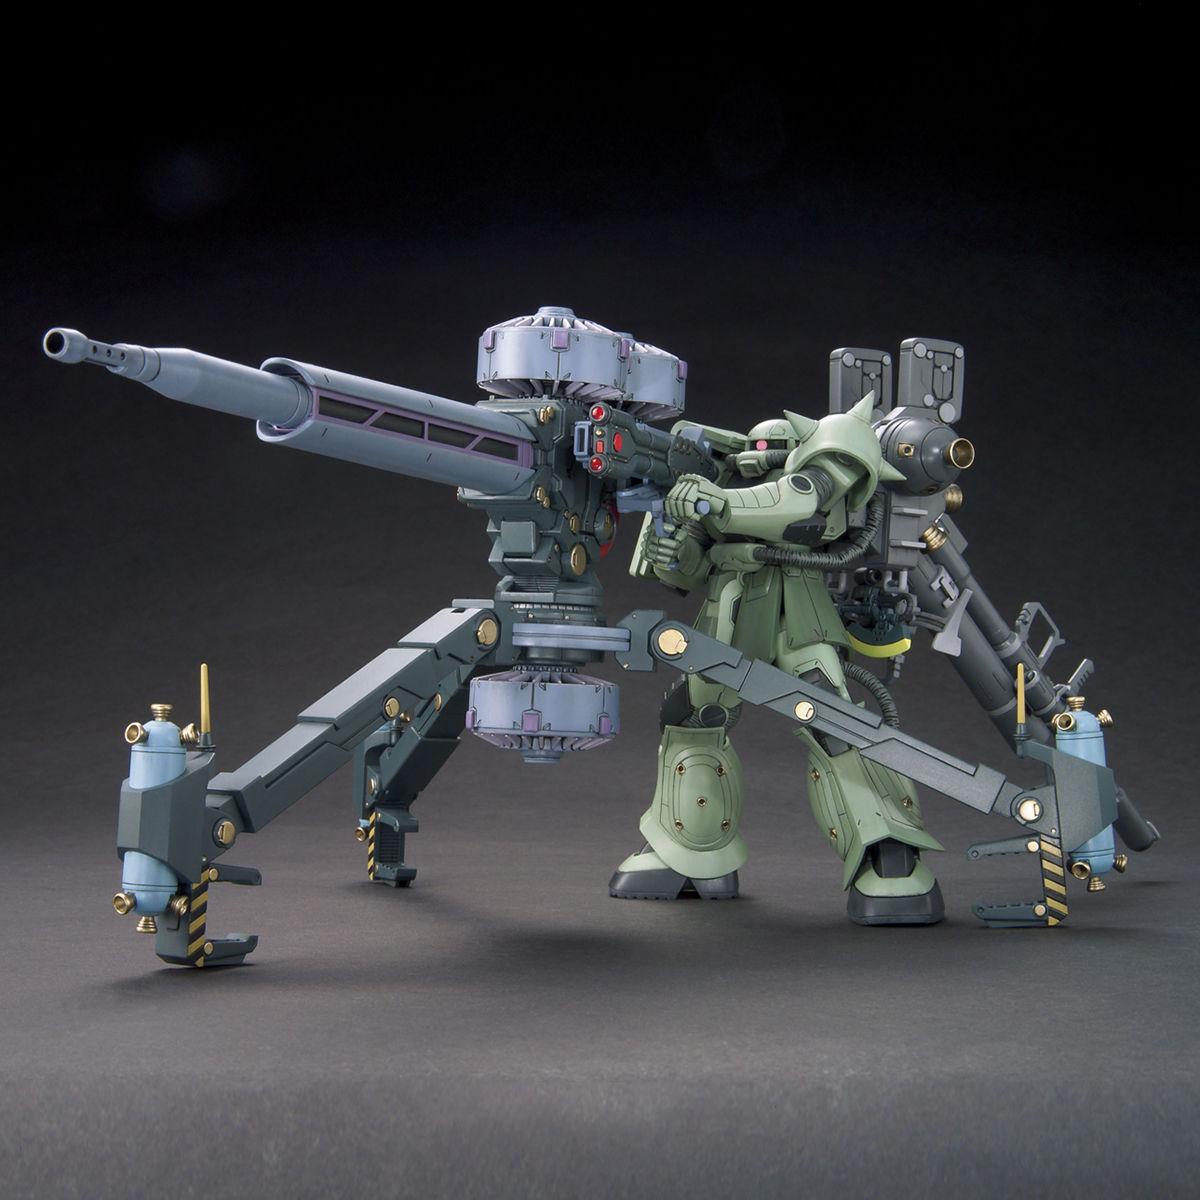 837HG 1/144 MS-06 量産型ザク+ビッグ・ガン(ガンダム サンダーボルト版) [Zaku II & Big Gun (Thunderbolt Manga Ver.)]